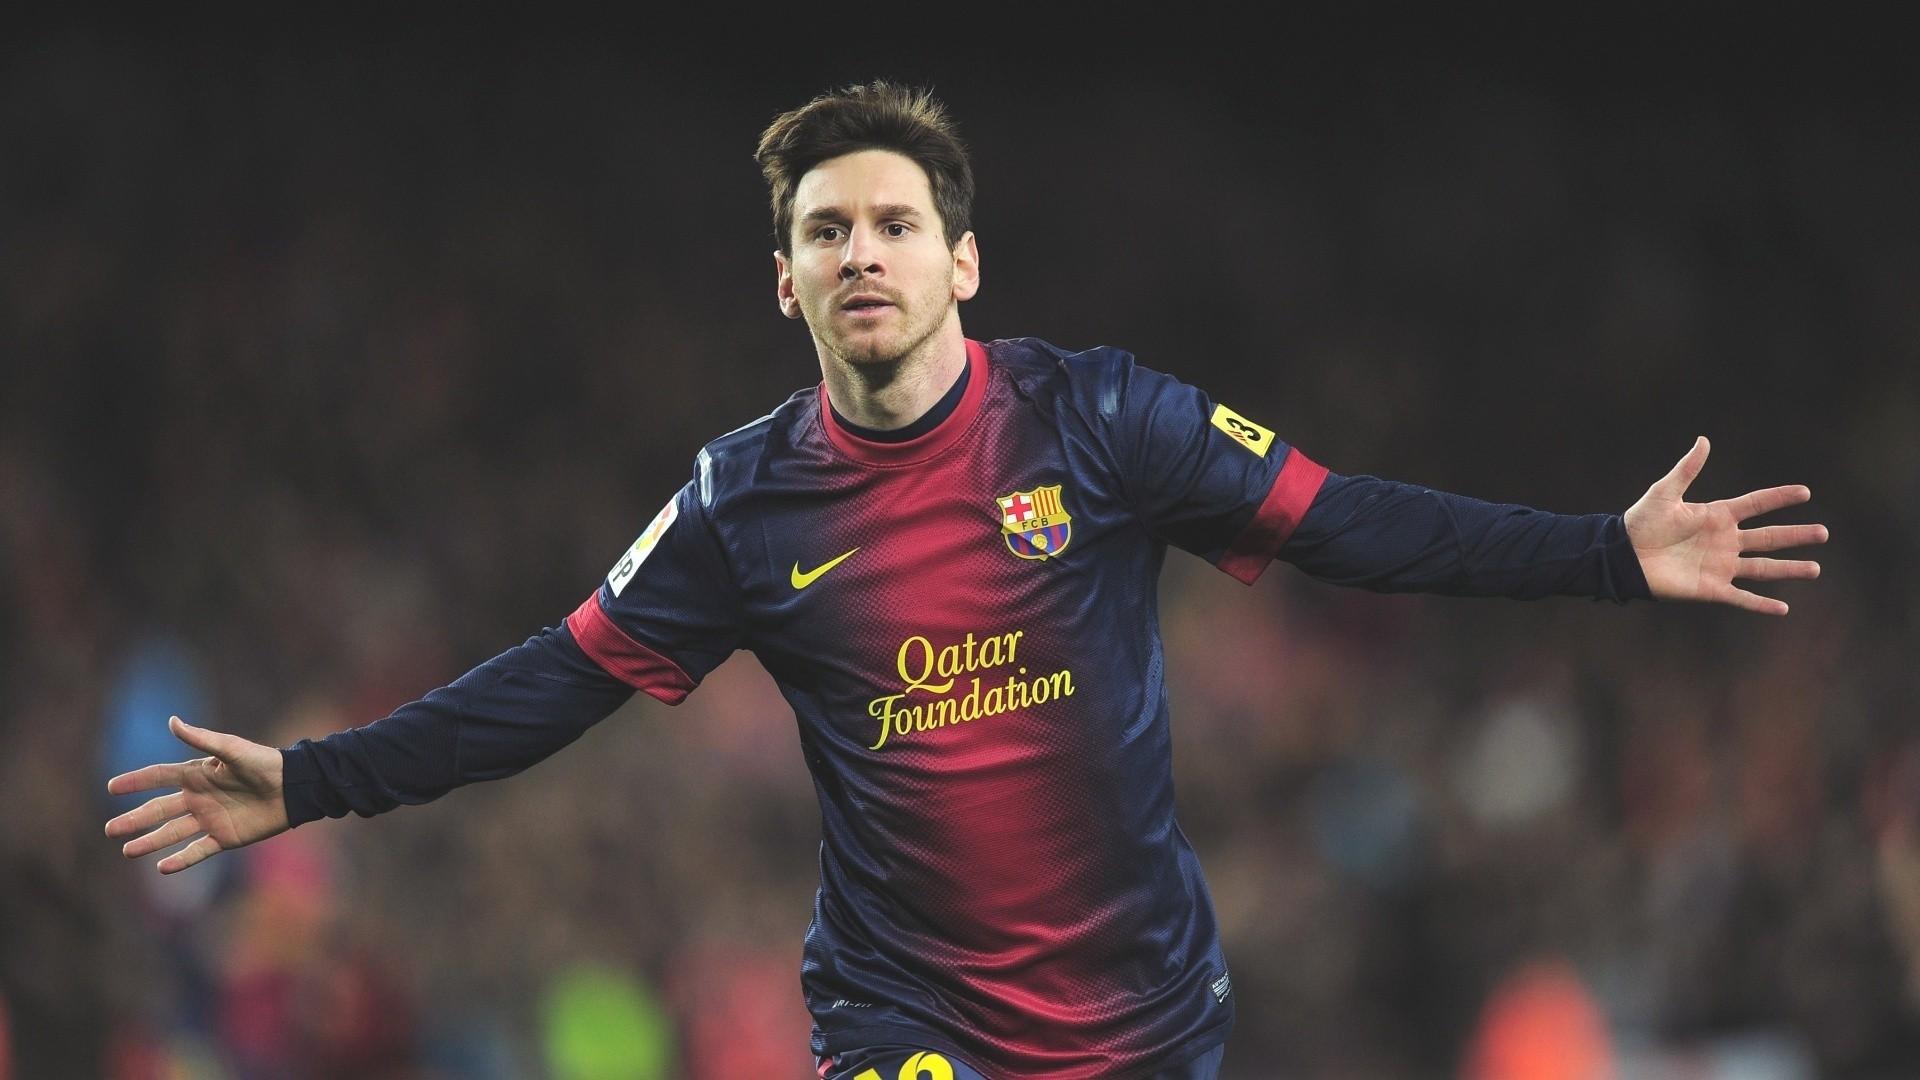 Lionel Messi hd wallpaper download